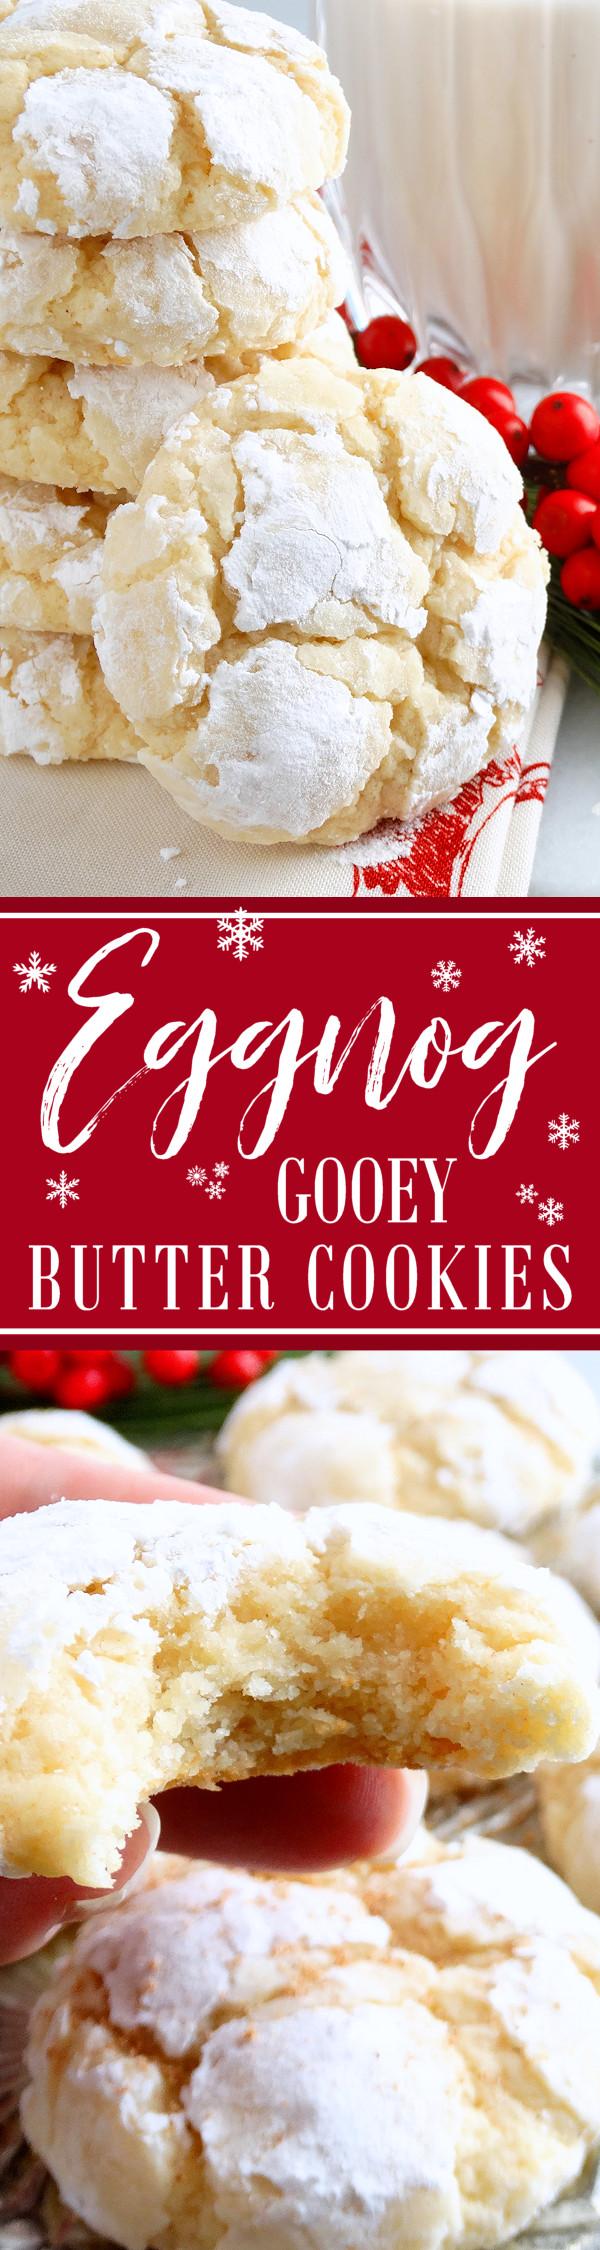 Gooey Butter Christmas Cookies  Eggnog Gooey Butter Cookies from scratch  Wicked Good